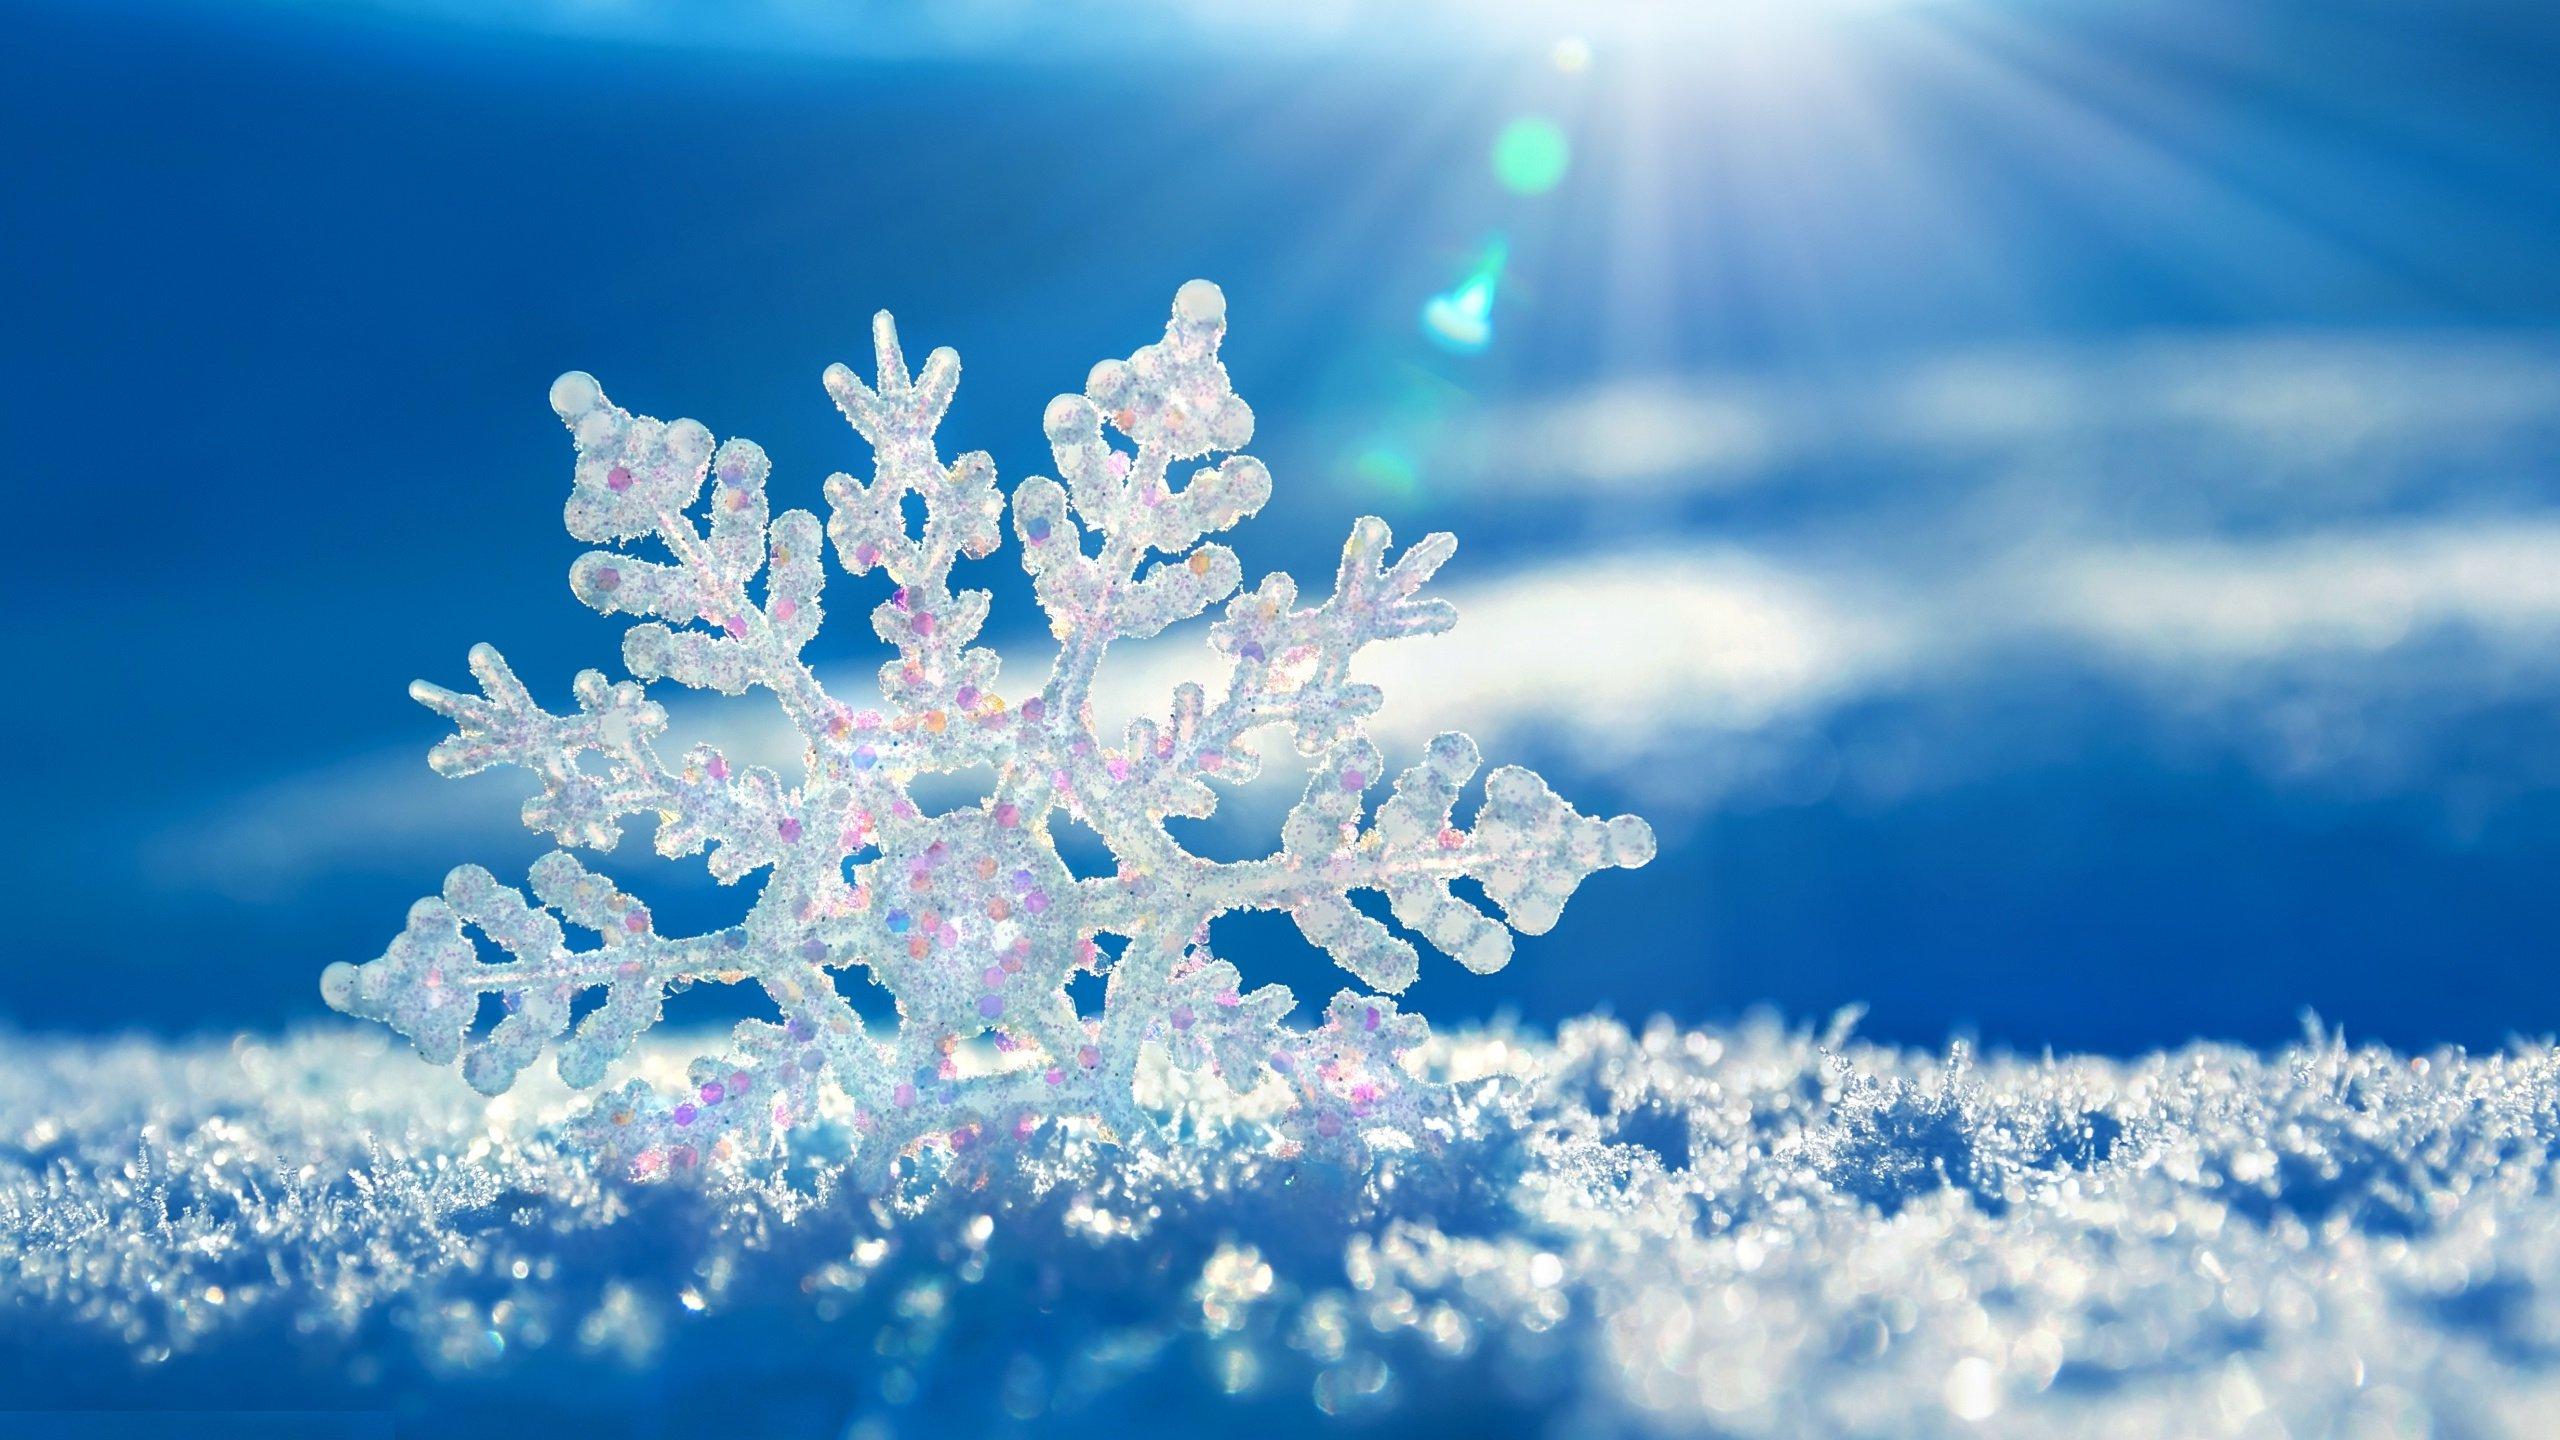 Народный синоптик Тускул предсказал теплую зиму